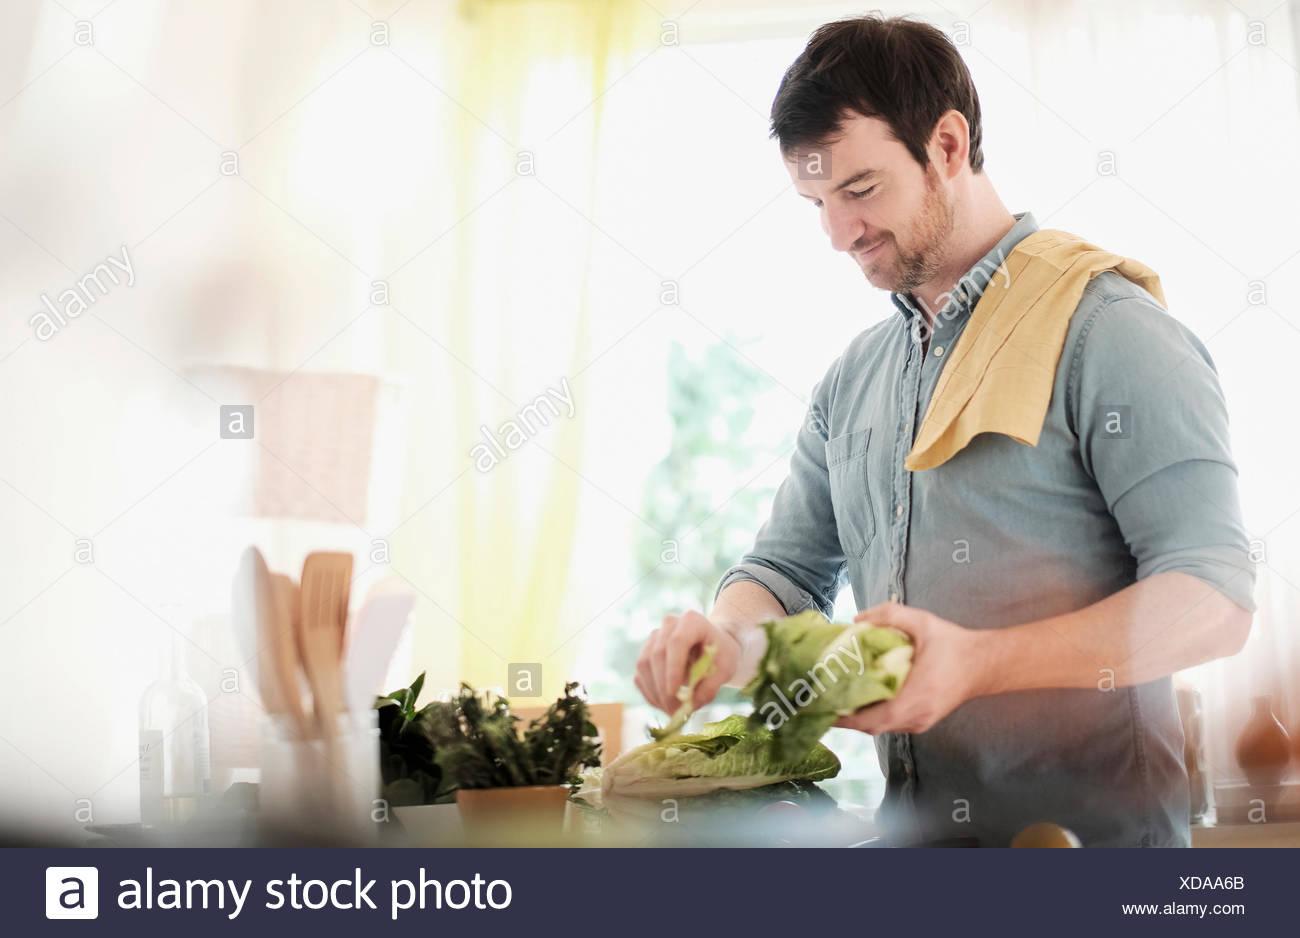 Man preparing food in kitchen Photo Stock